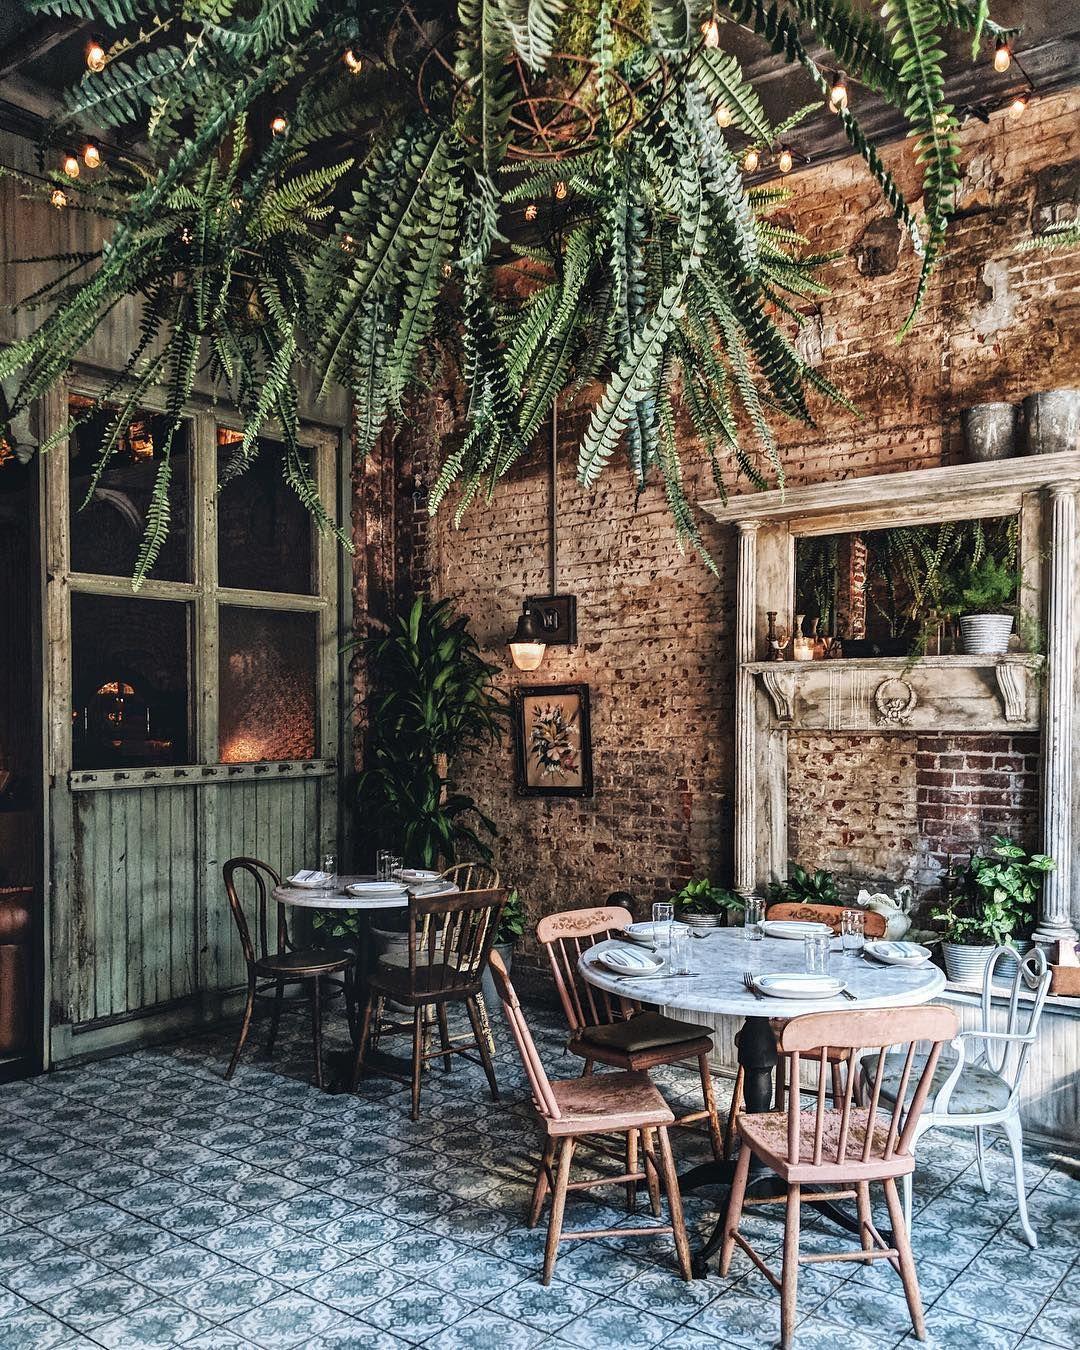 Harp & Crown bar & restaurant in Philadelphia Guests may